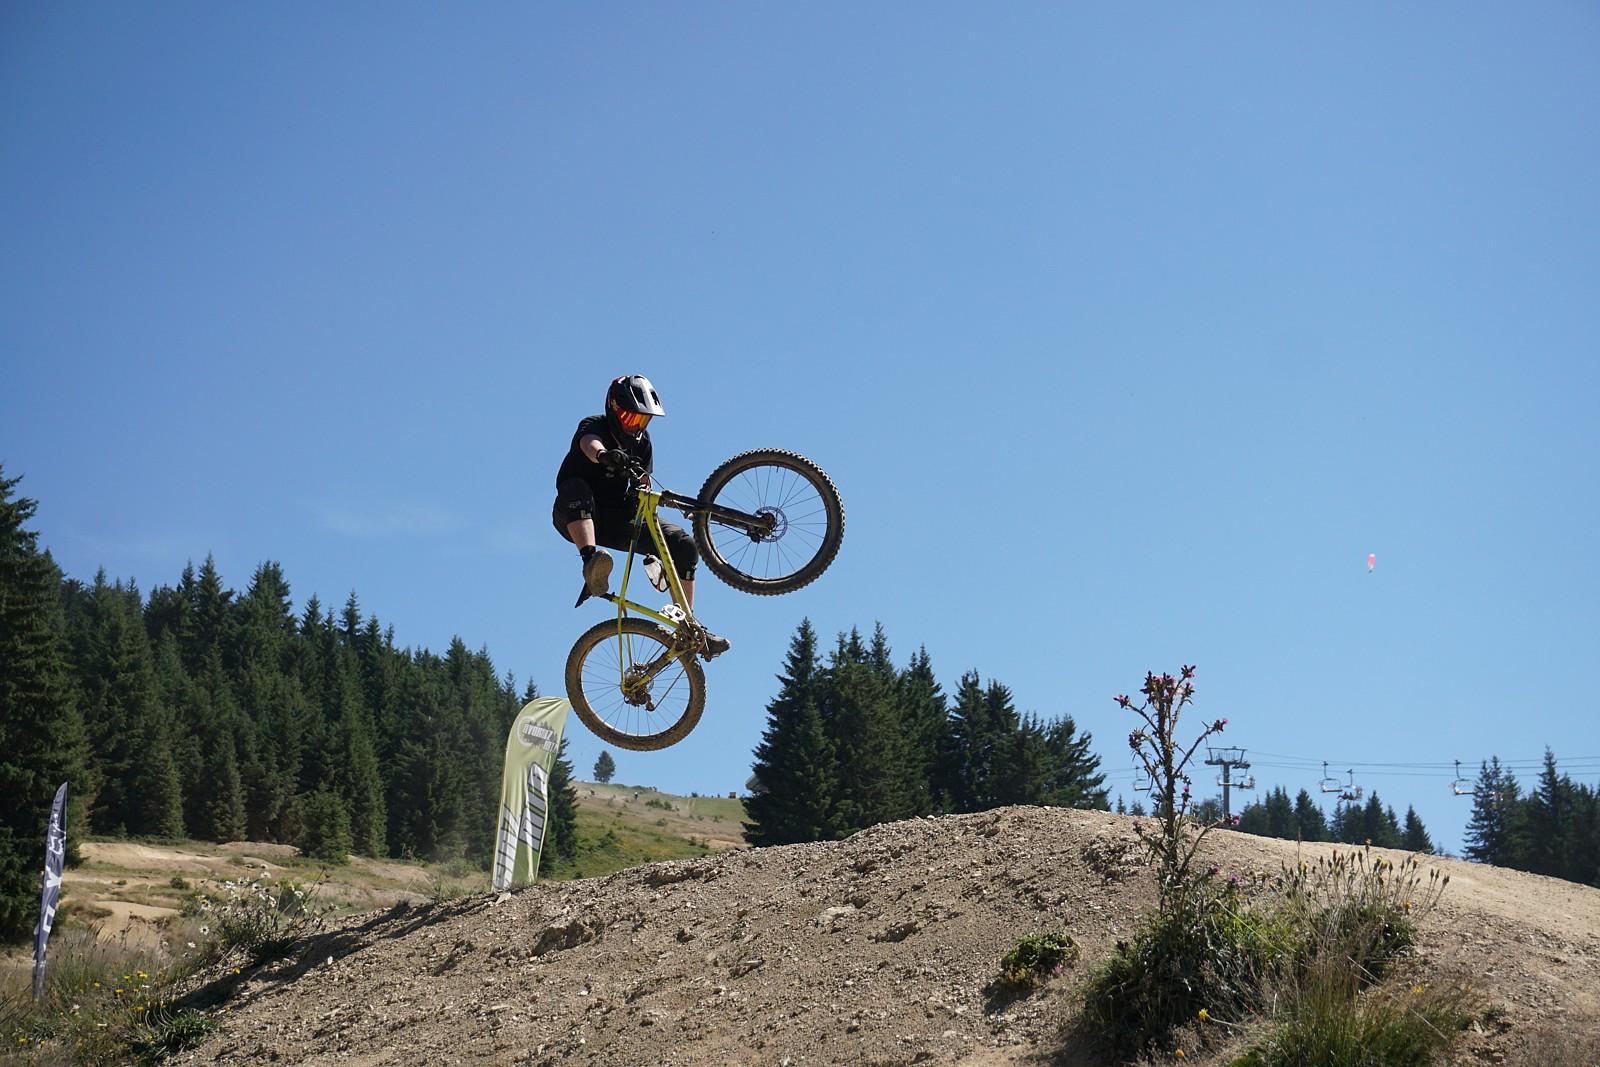 DSC08527 - c1c51 - Mountain Biking Pictures - Vital MTB